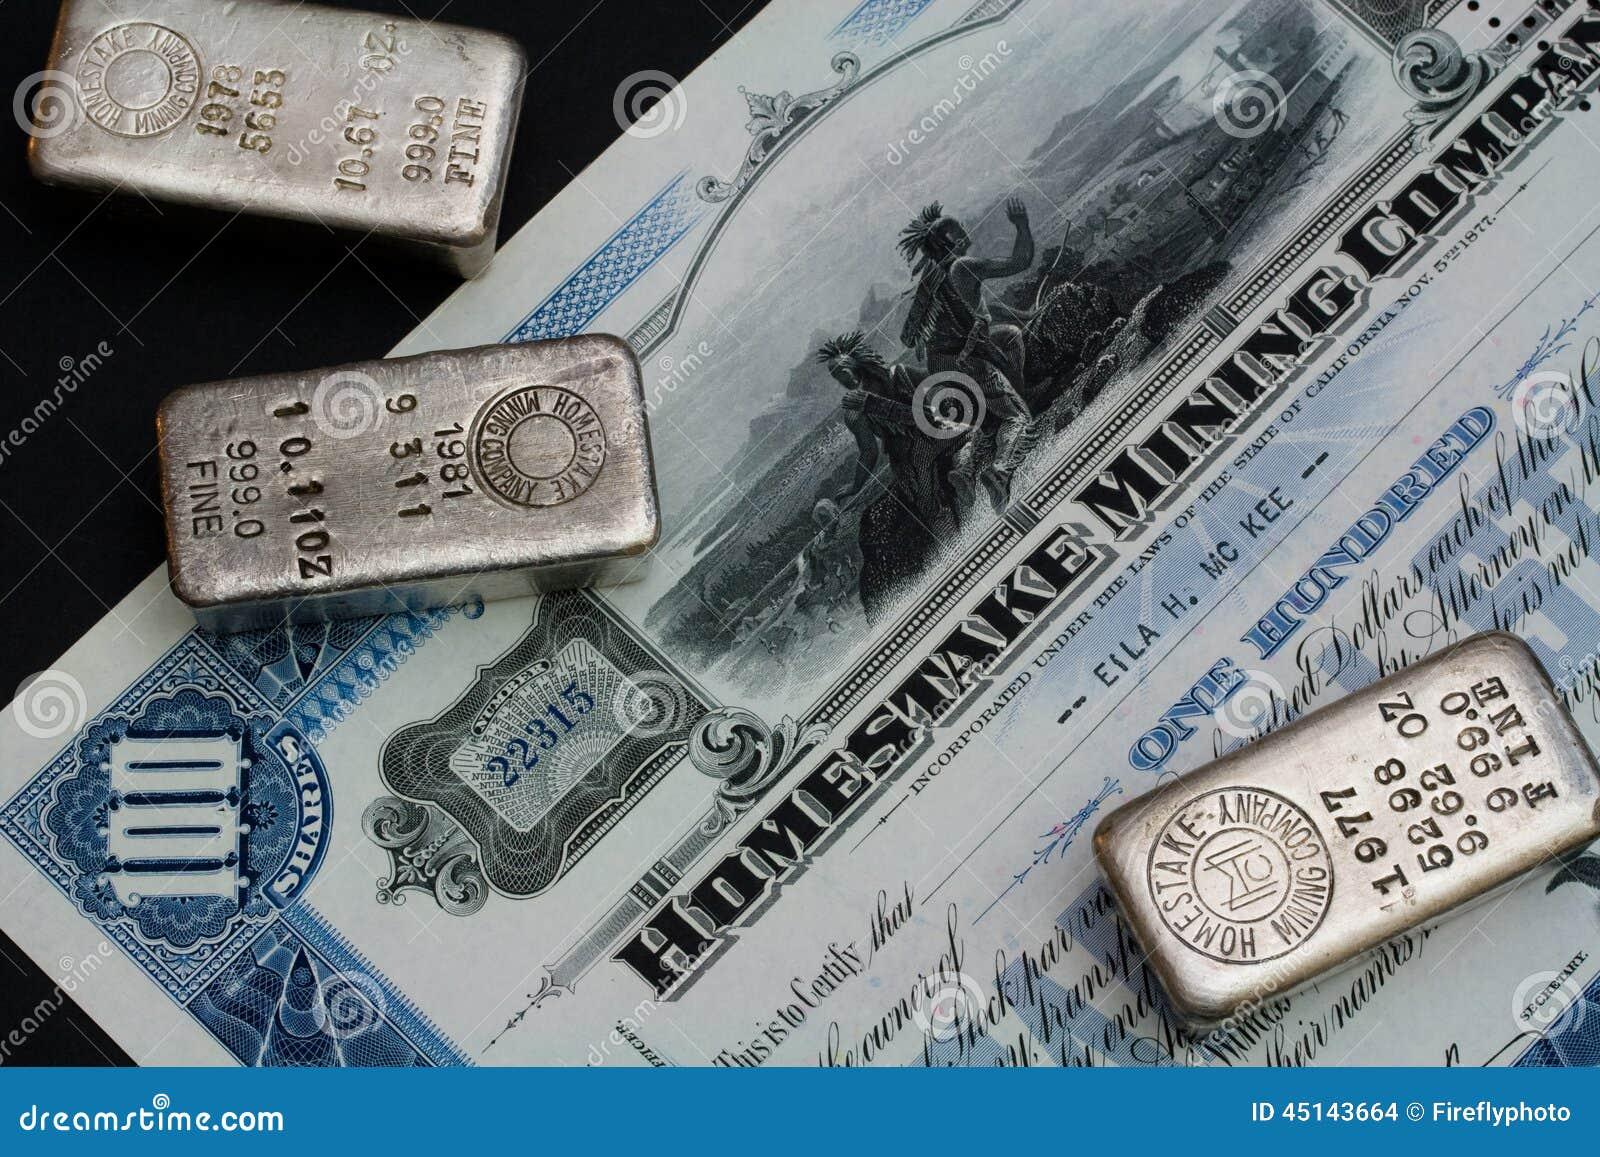 Original Homestake Mining Company Stock Certificate And